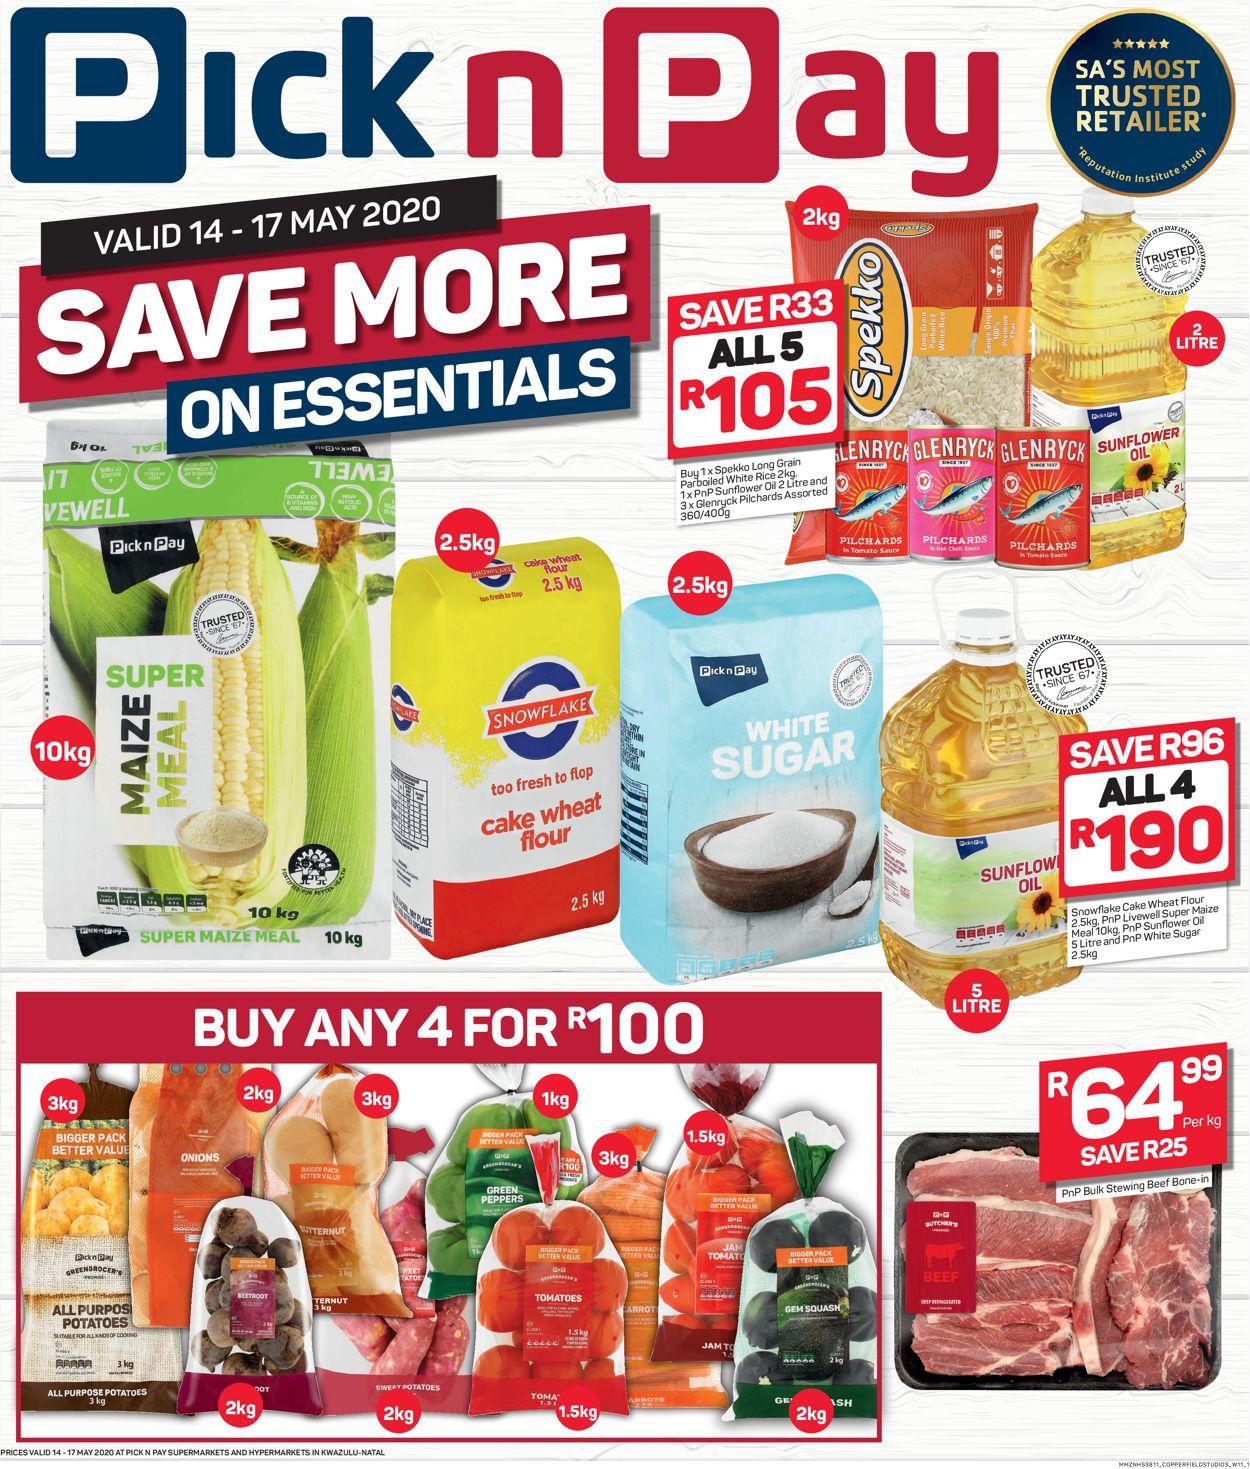 Pick n Pay Catalogue - 2020/05/14-2020/05/17